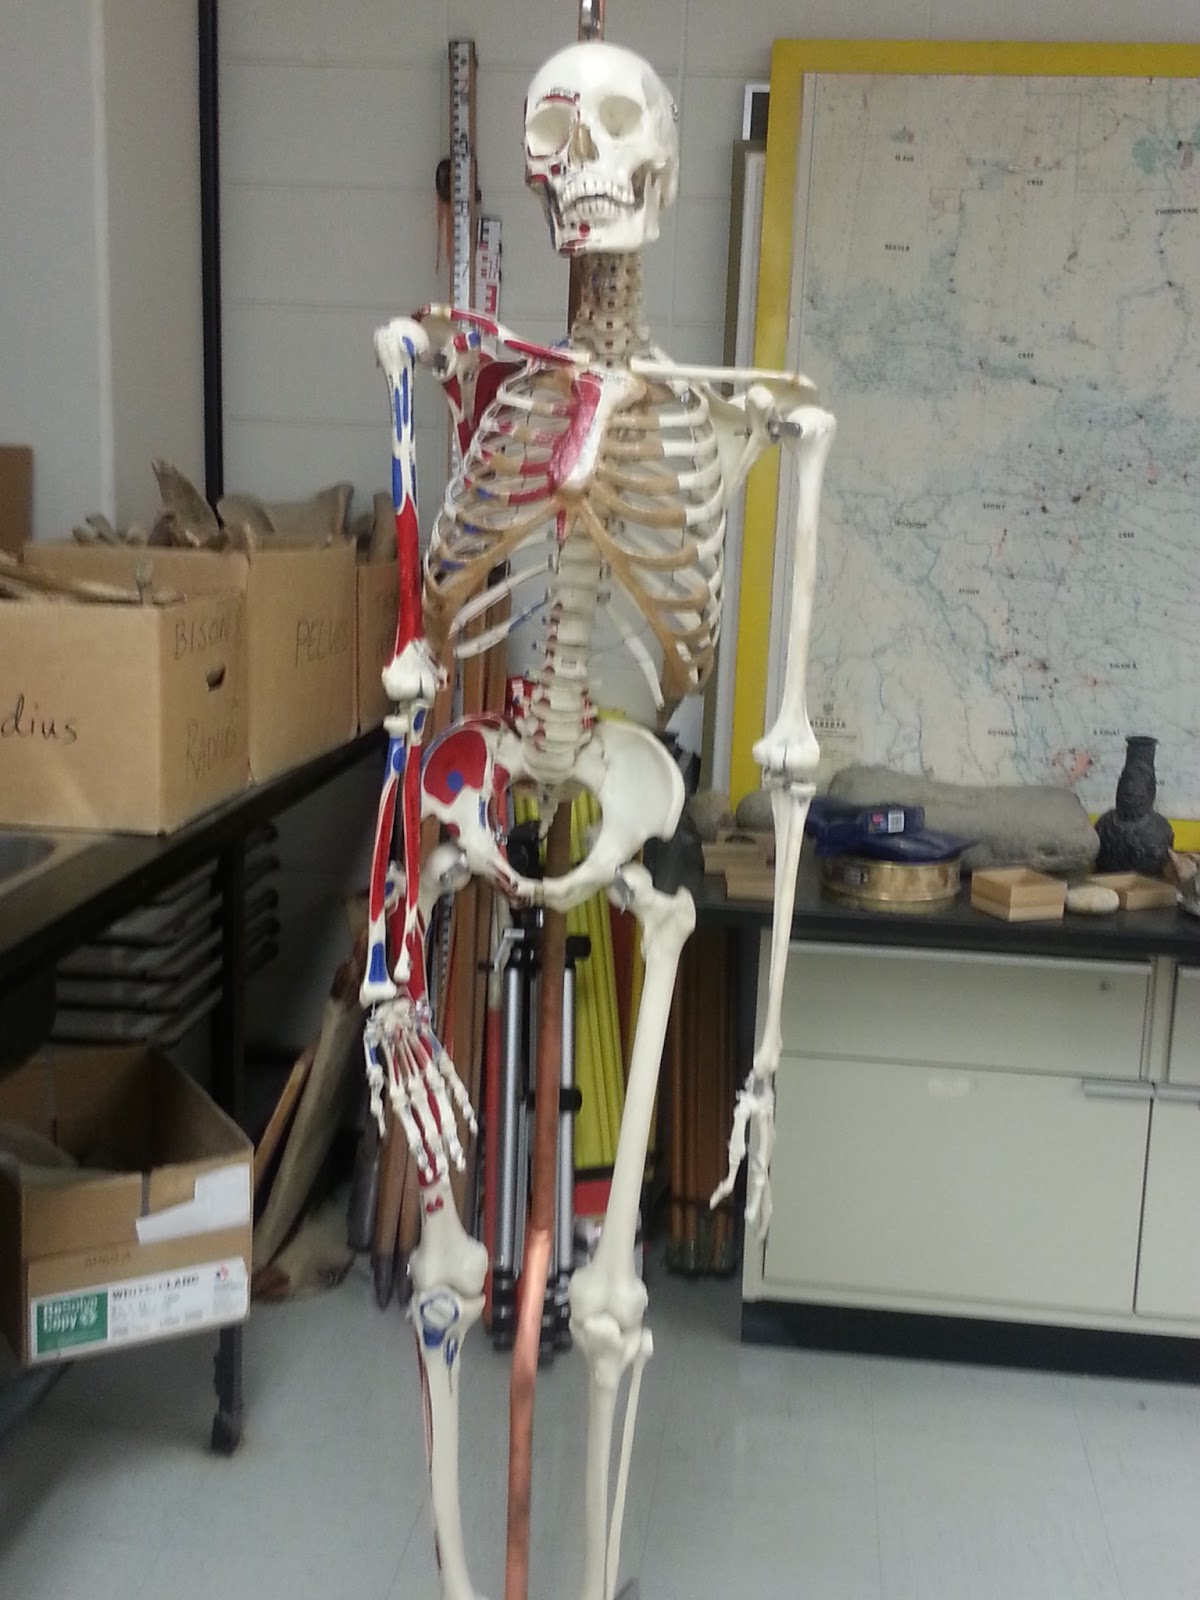 Writer of Wrongs: Forensic Fridays Part 2: Anatomy of Murder